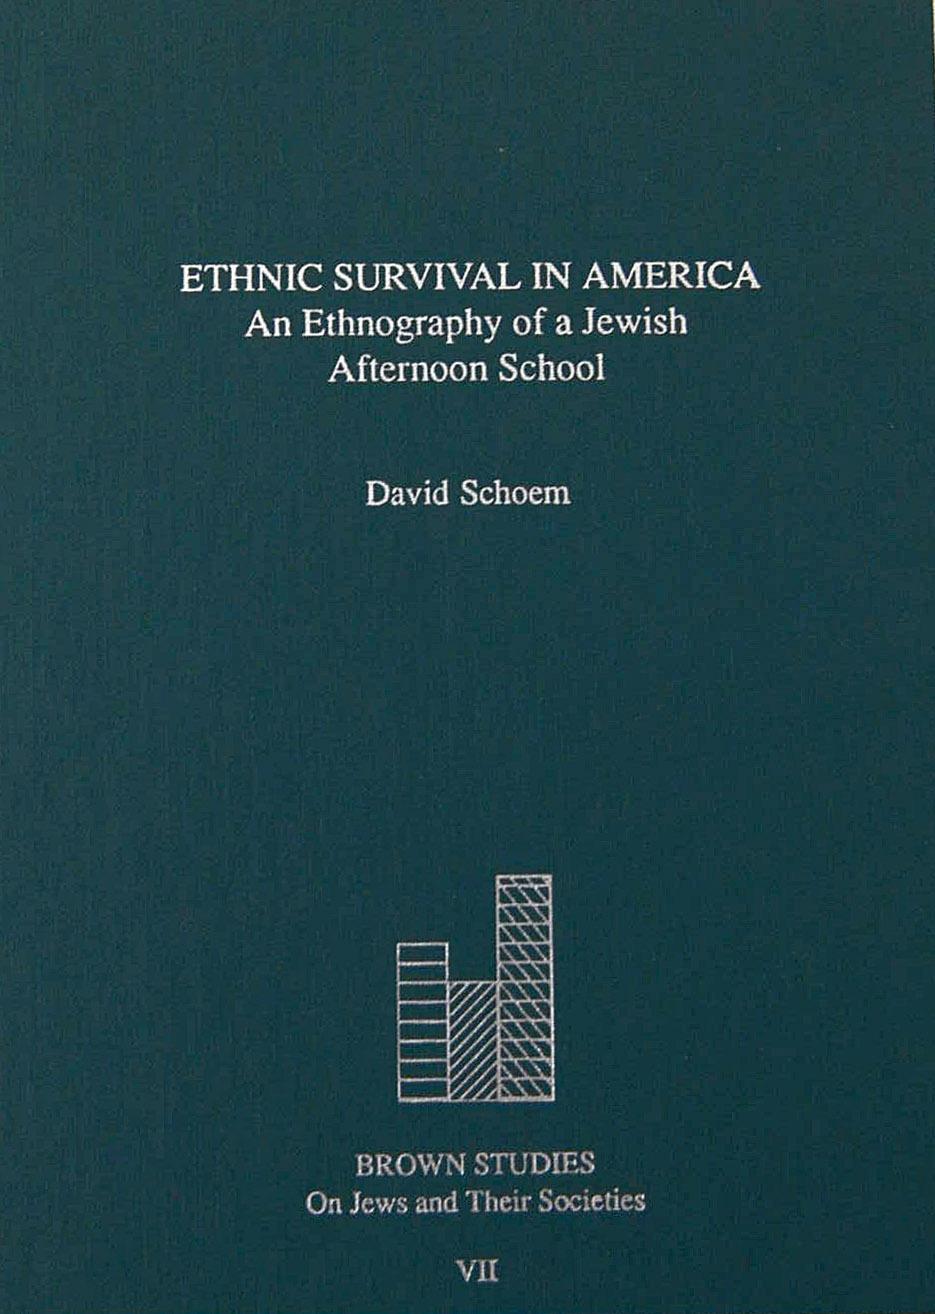 EthnicSurvivalinAmerica